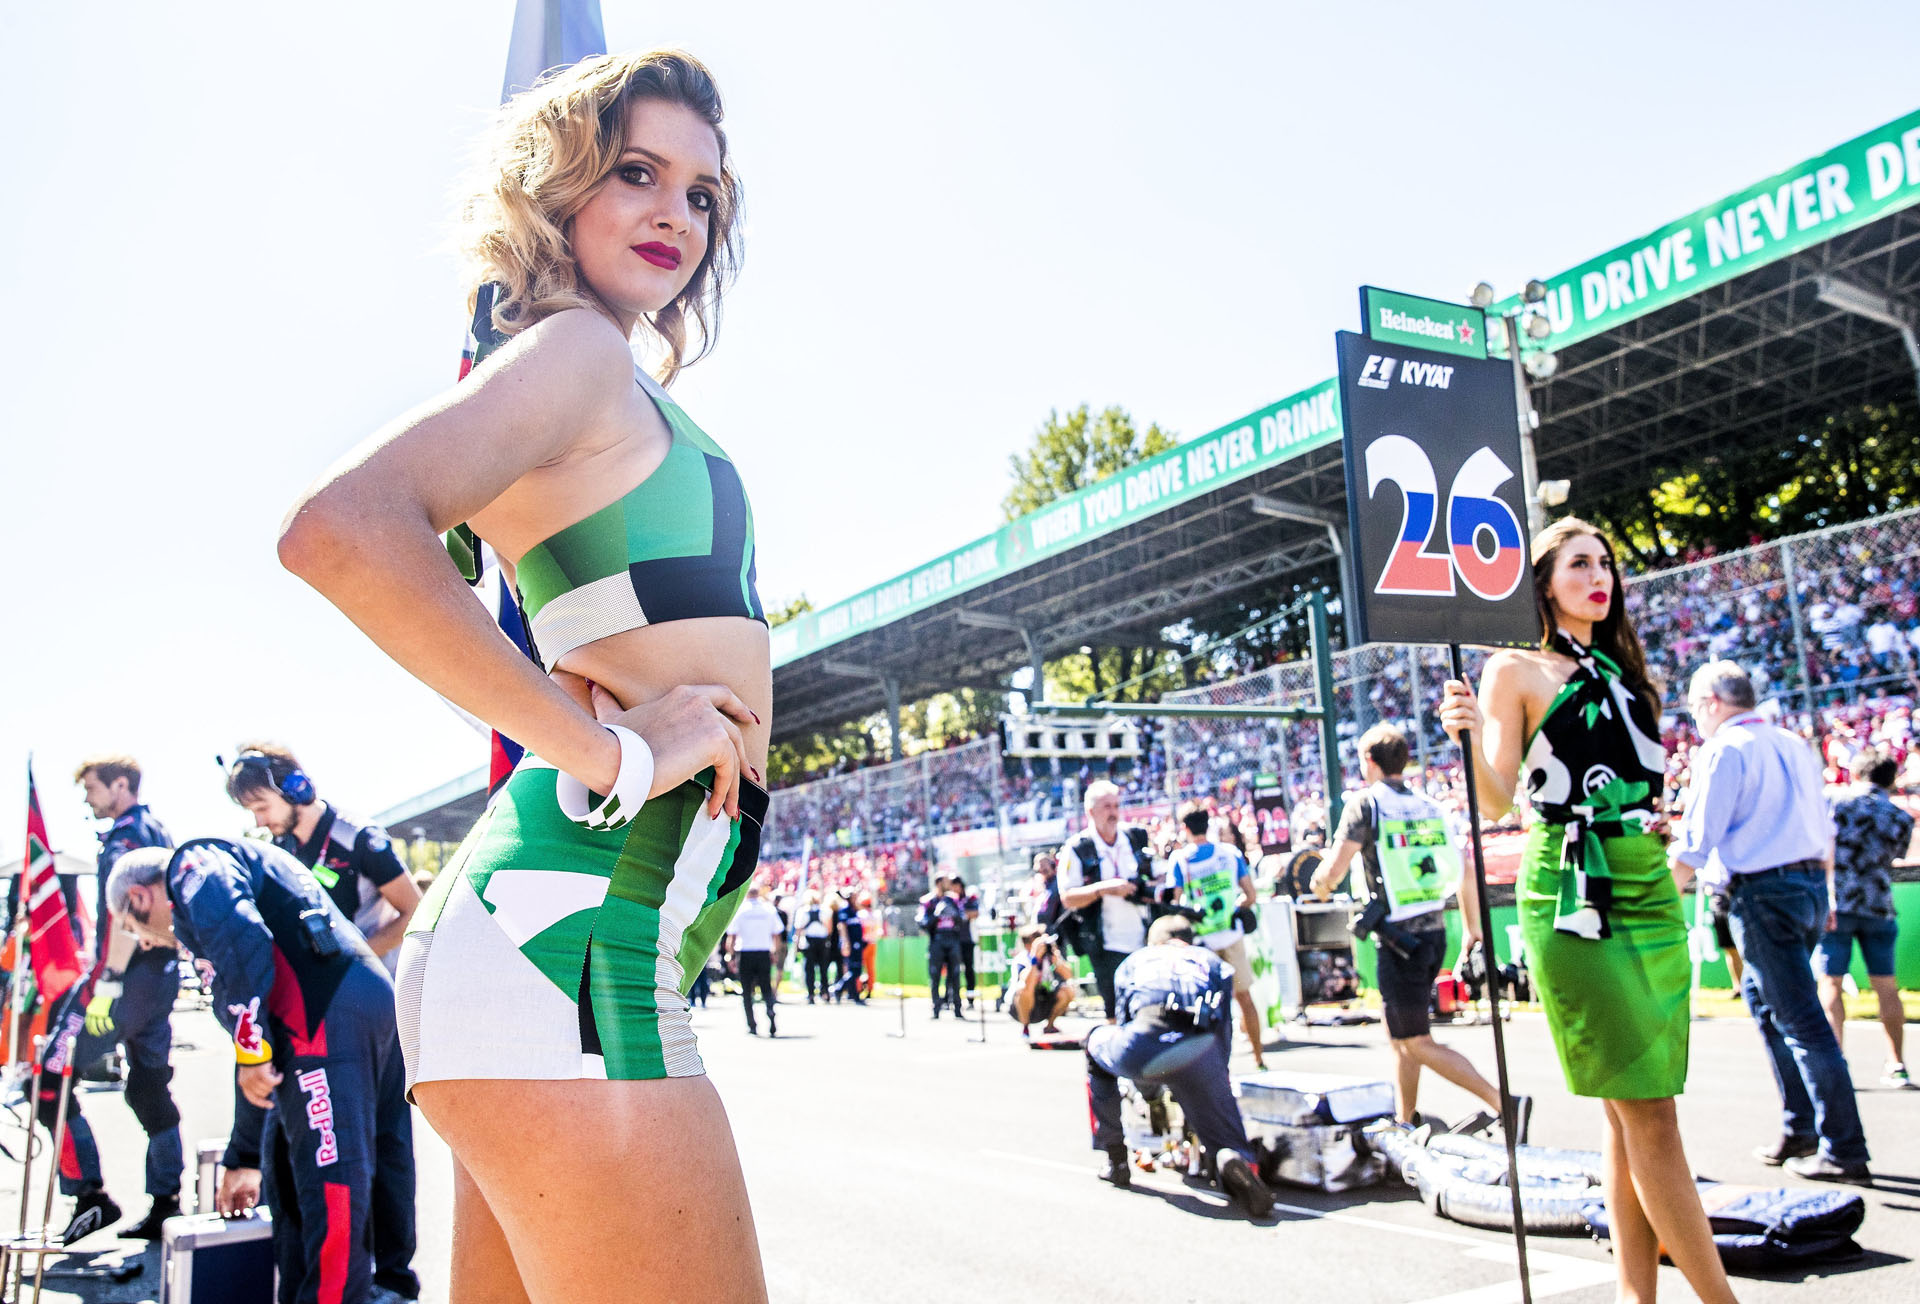 SUKI29. Monza (Italy), 03/09/2017.- Italian Grid girls prior to 2017 Formula One Grand Prix of Italy at the Formula One circuit in Monza, Italy, 03 September 2017. (Fórmula Uno, Italia) EFE/EPA/SRDJAN SUKI